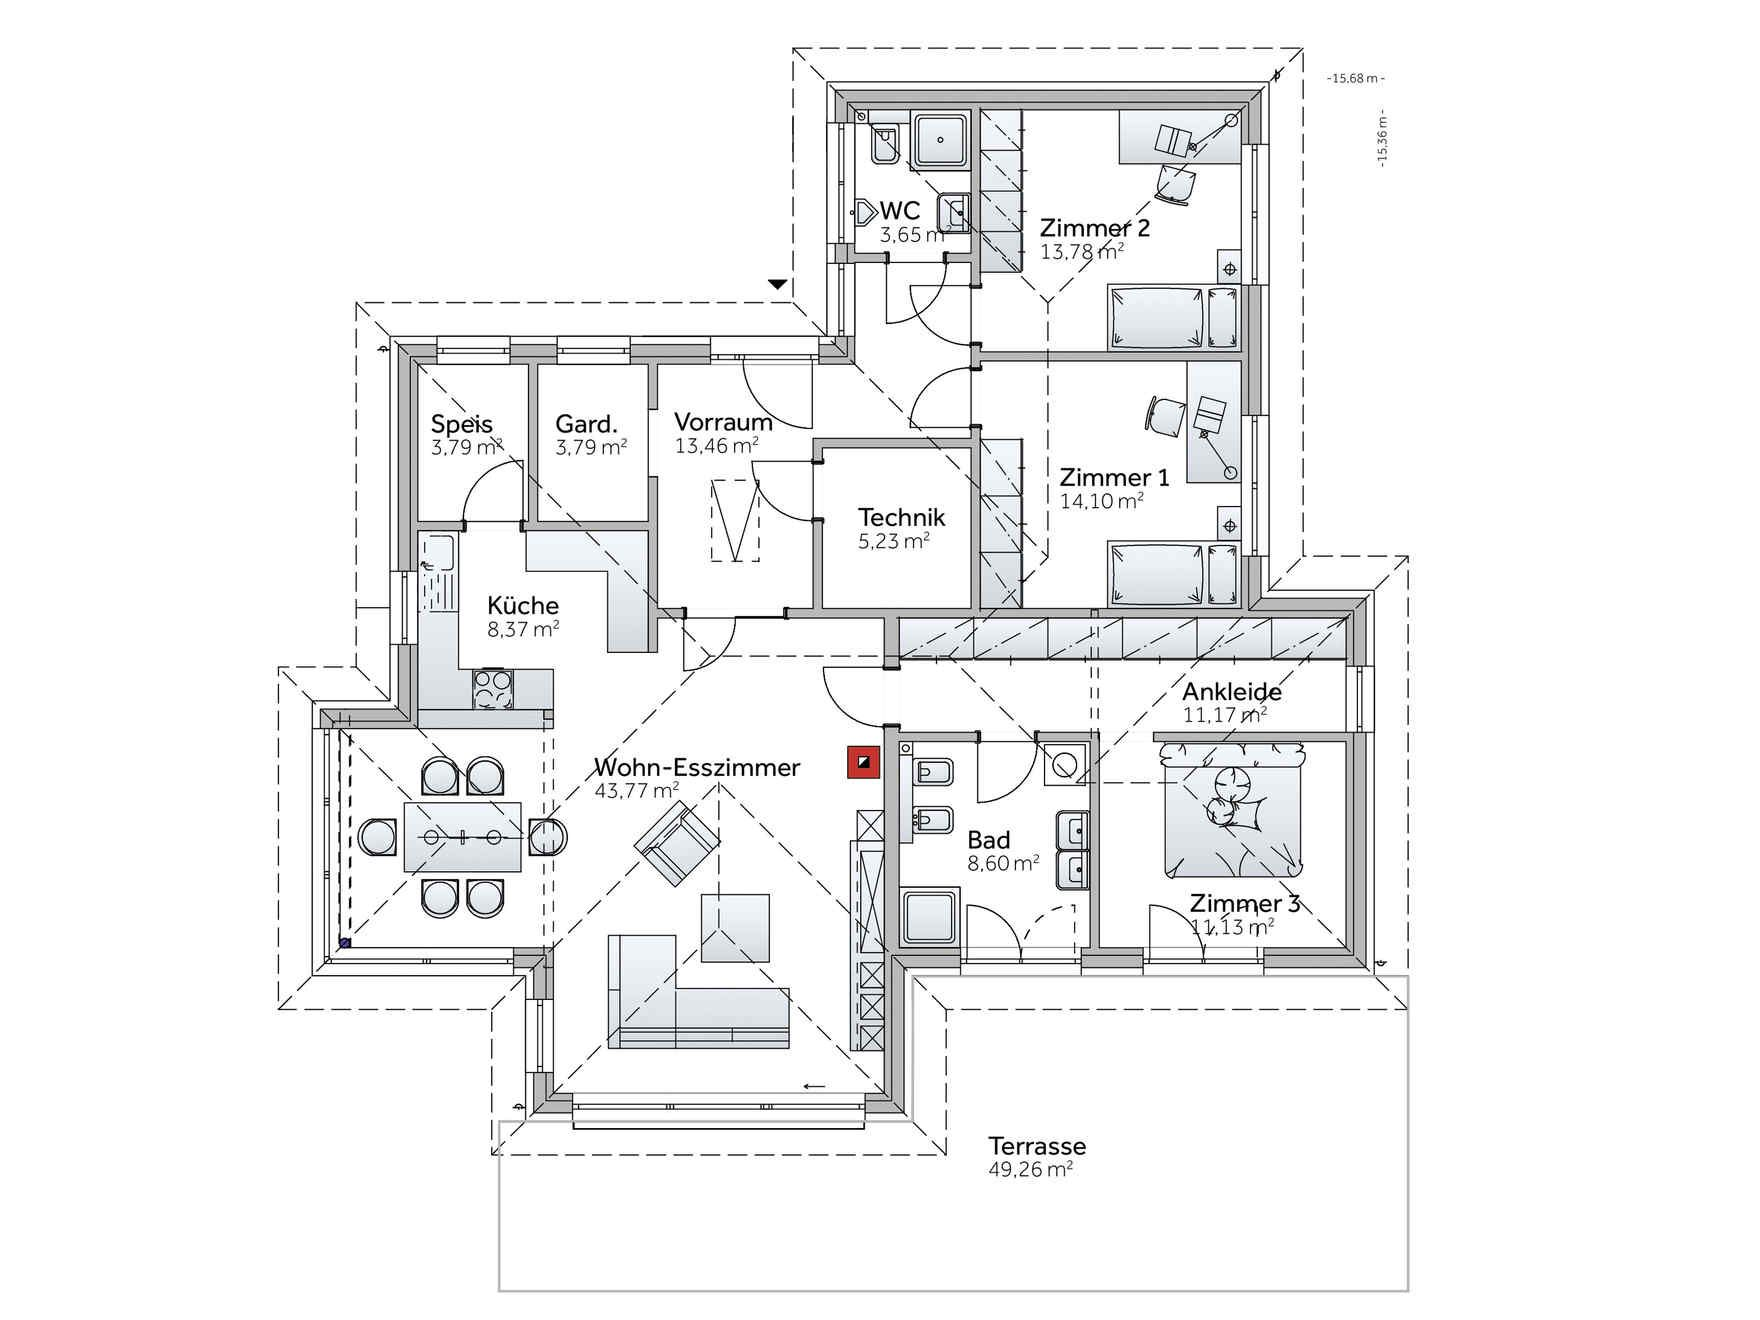 Musterhaus grundriss bungalow  Fertighaus Bungalow S141 | Architektur | Pinterest | Fertighaus ...